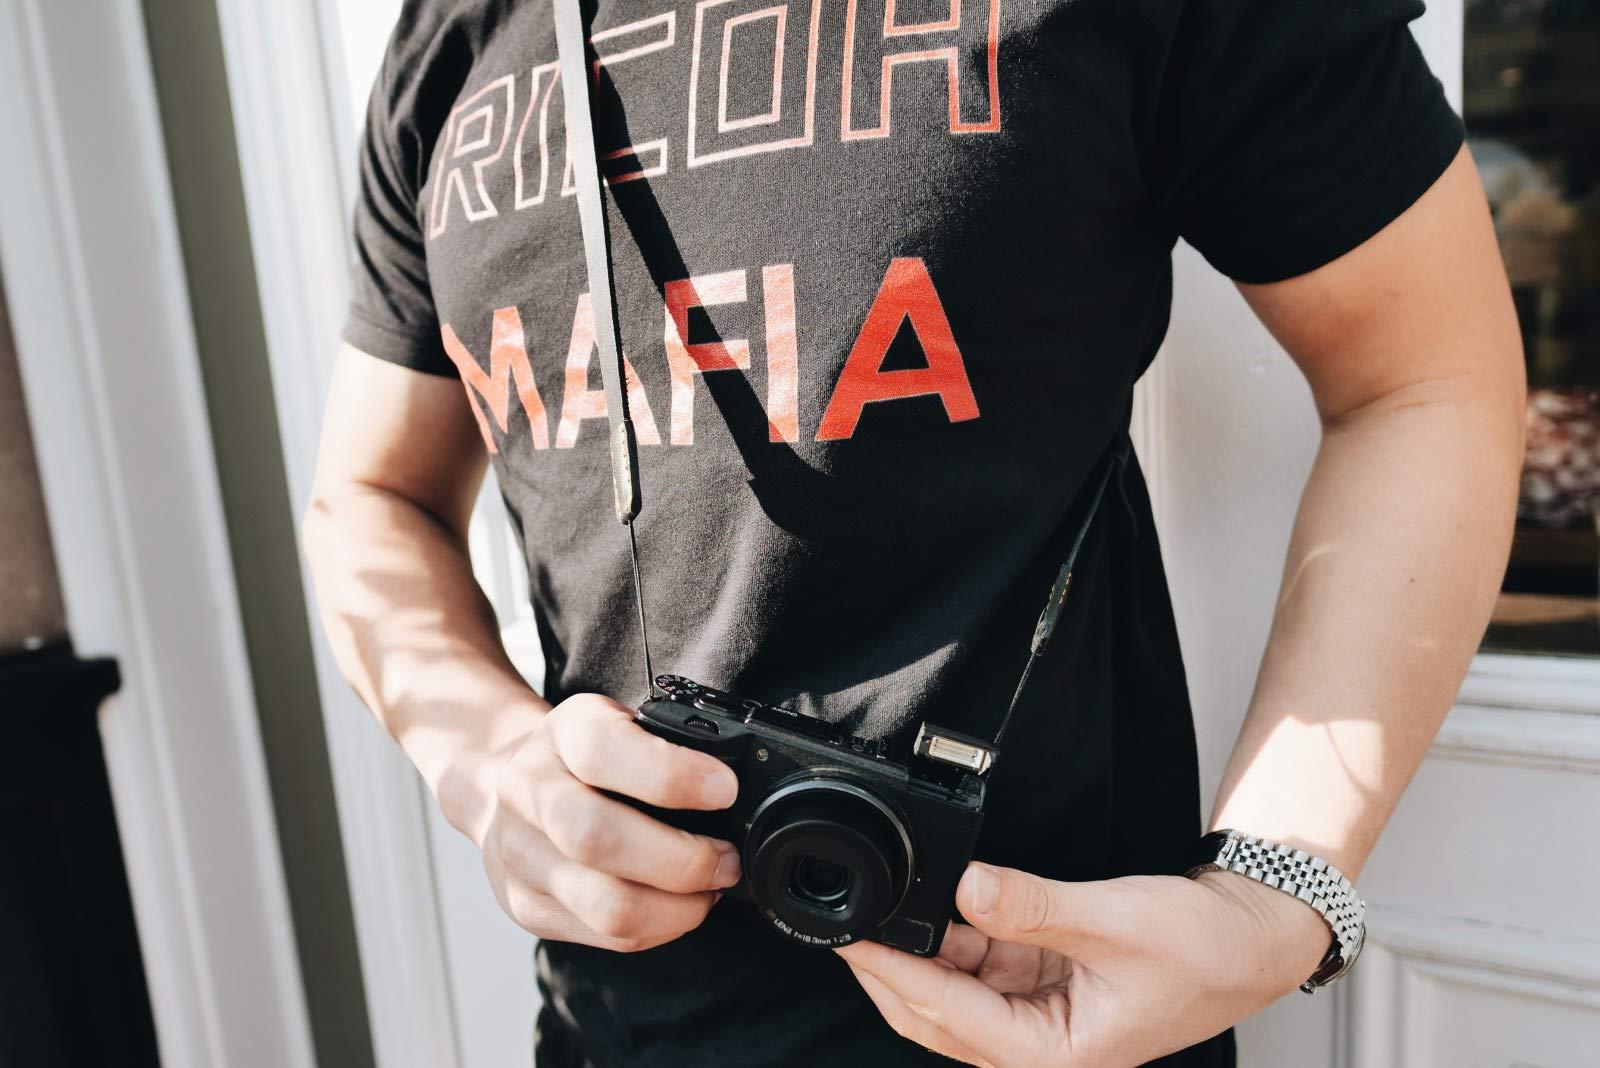 ERIC KIM NECK STRAP - Handmade Premium Leather Camera Strap, Fits Ricoh GR